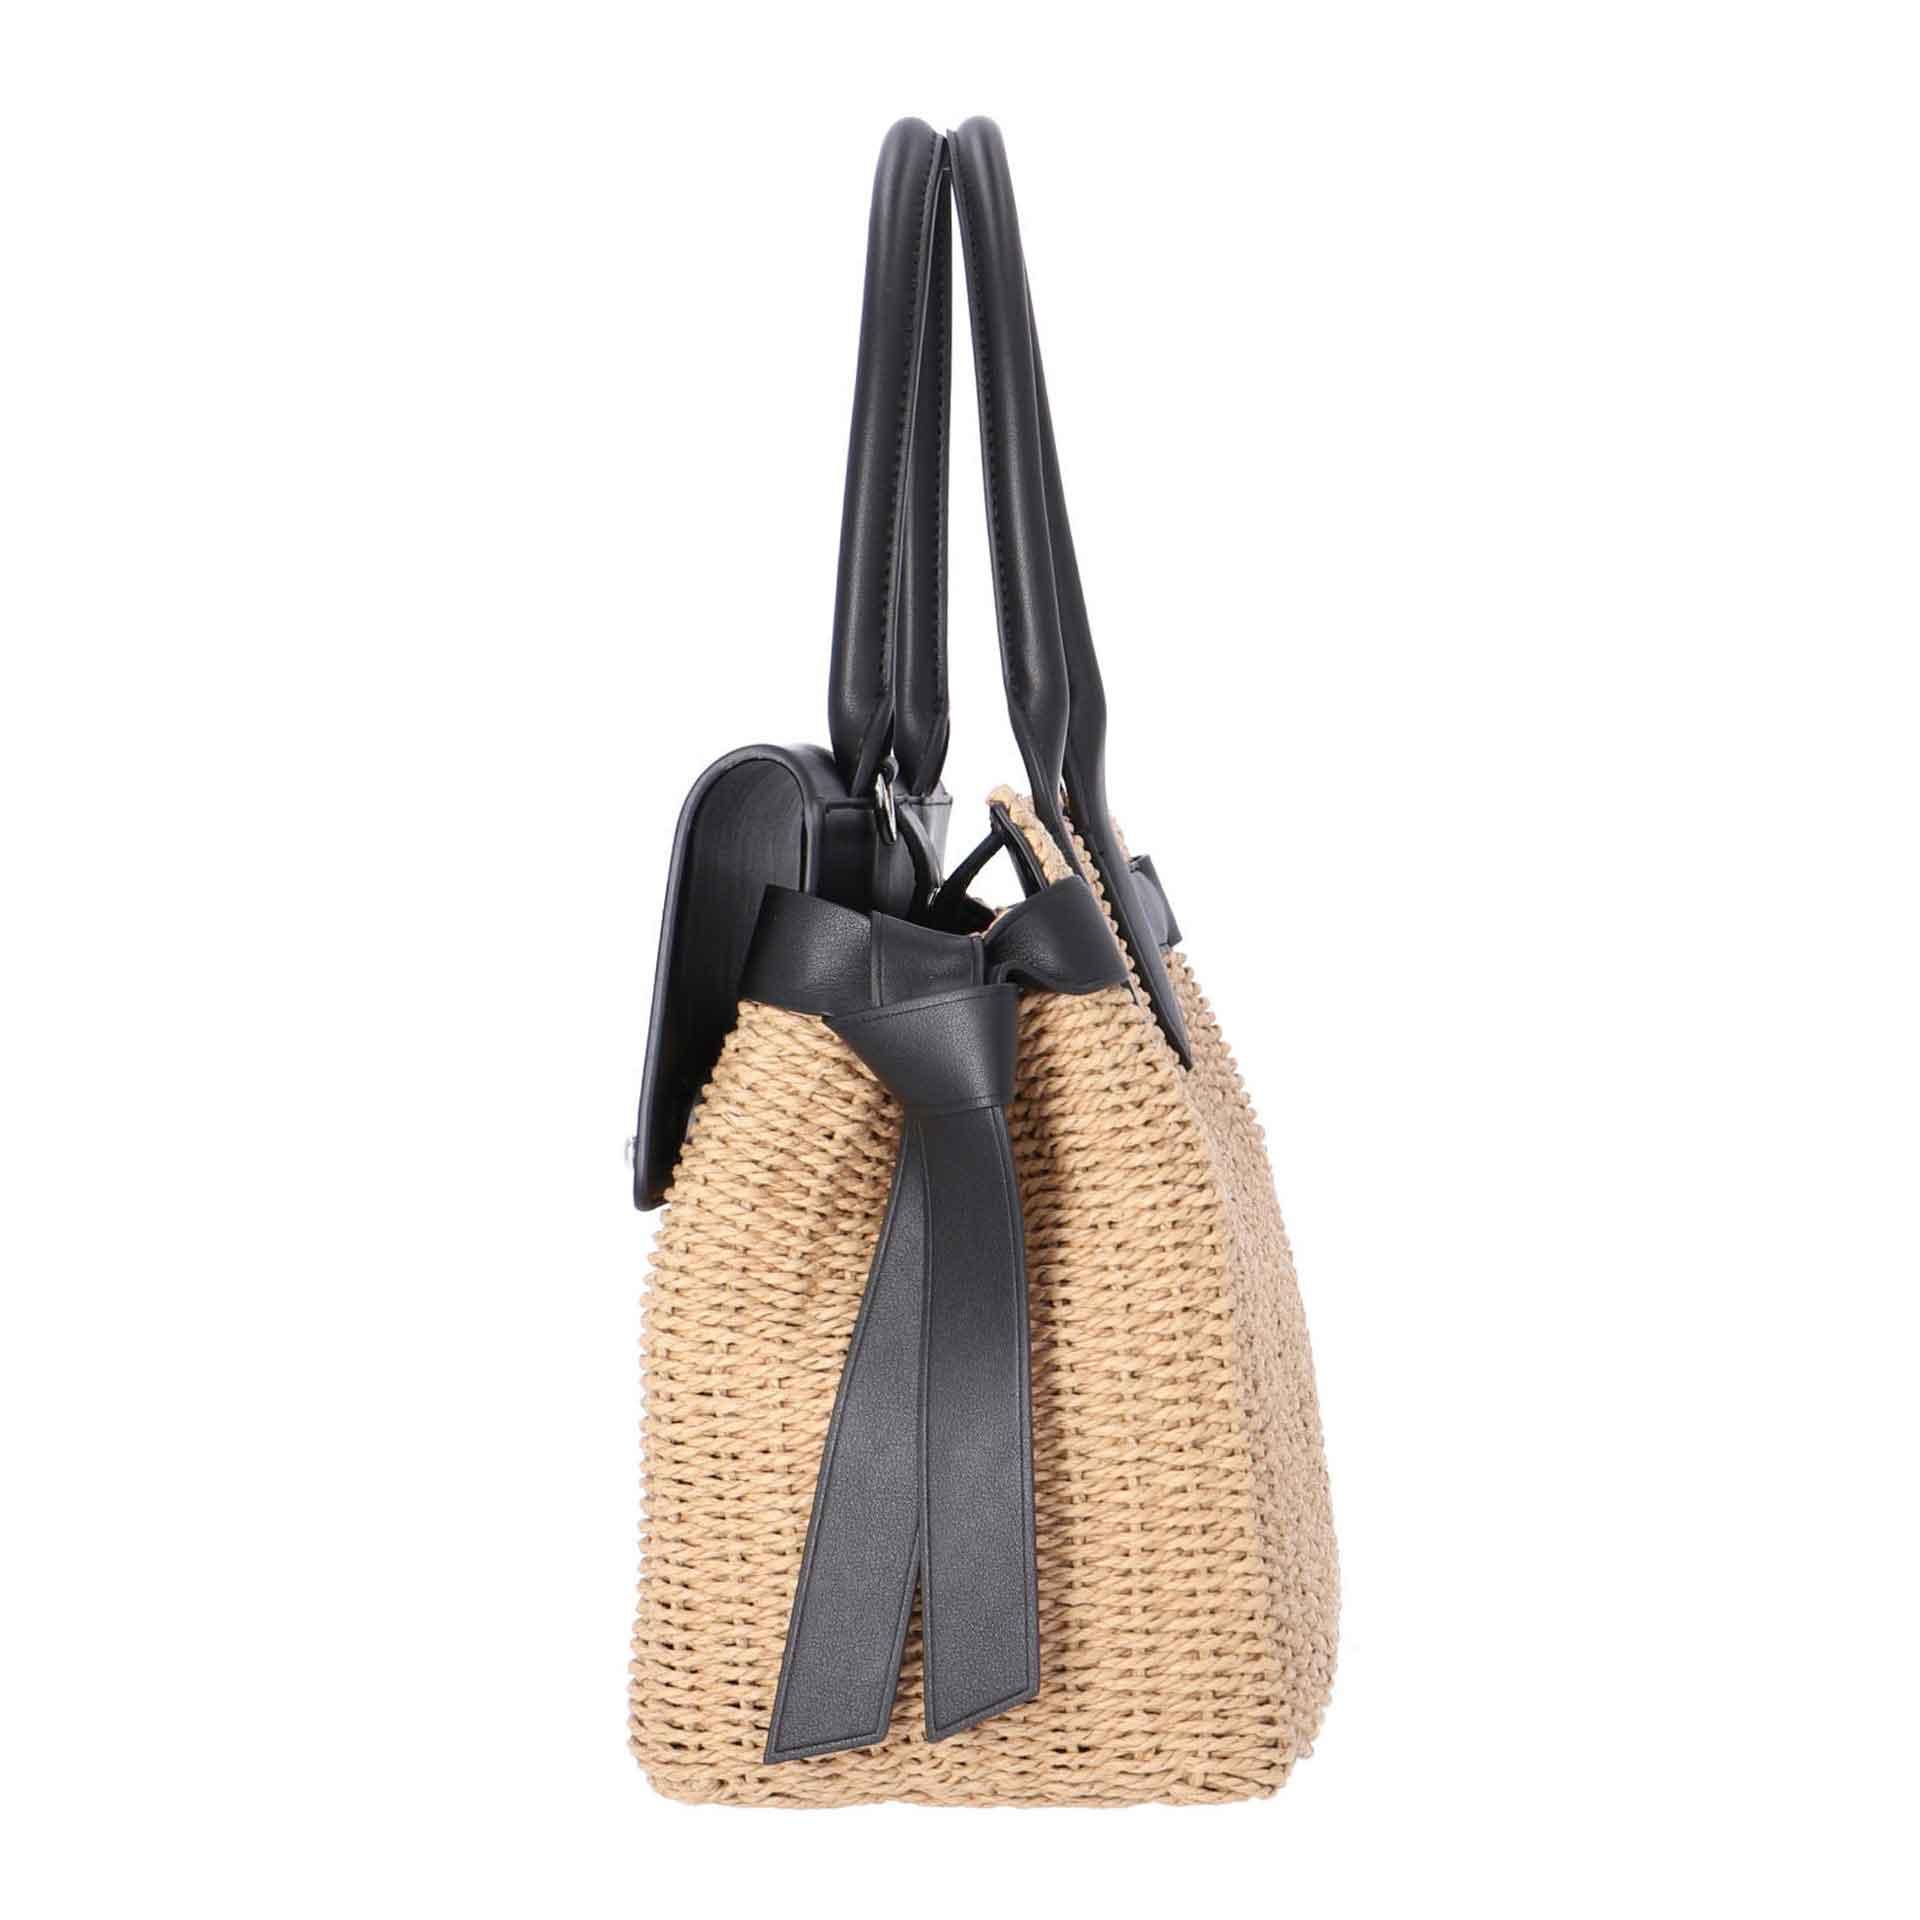 Karl Lagerfeld K/Ikon  Handtasche naturel black